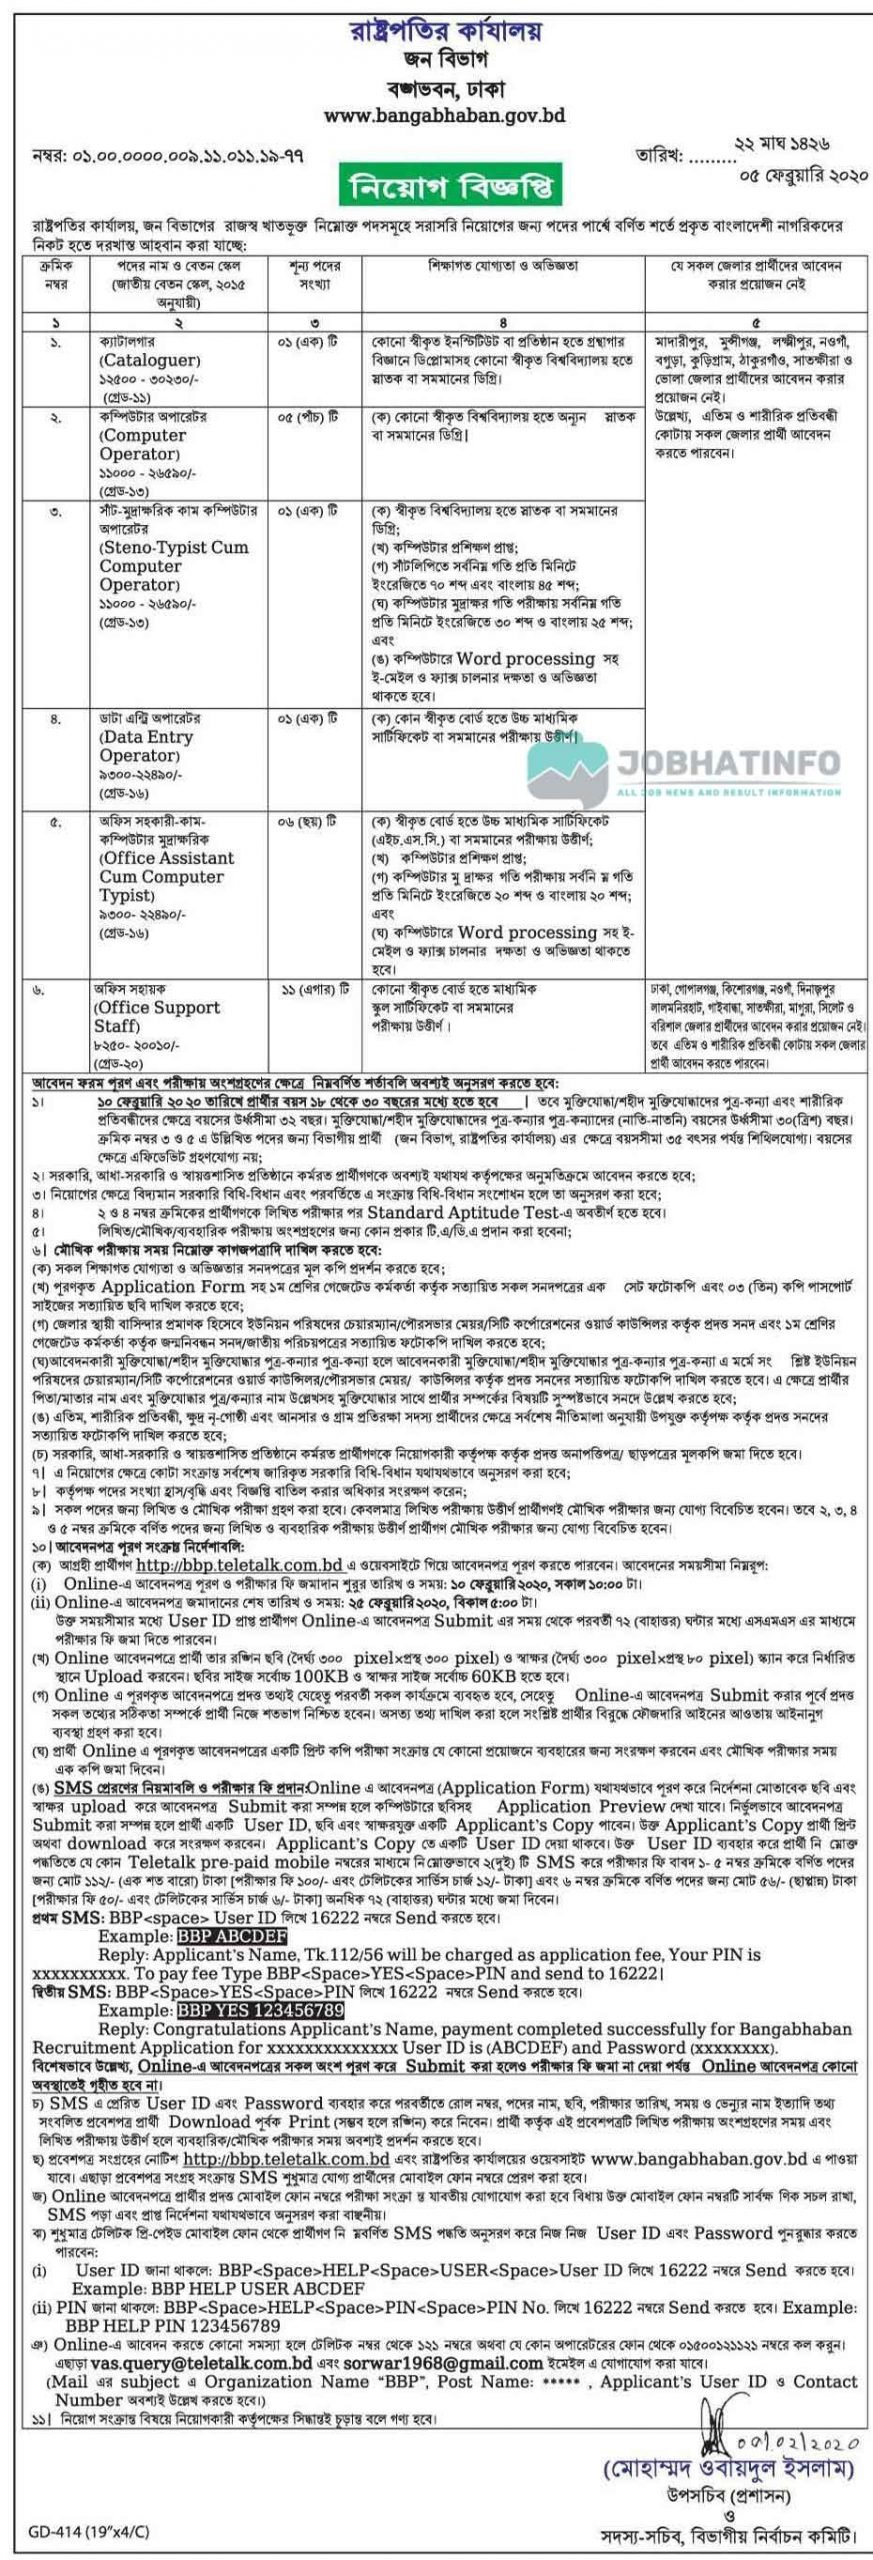 Bangabhaban Job Circular 2020   Office of the President of Bangladesh   Govt Job Circular 1